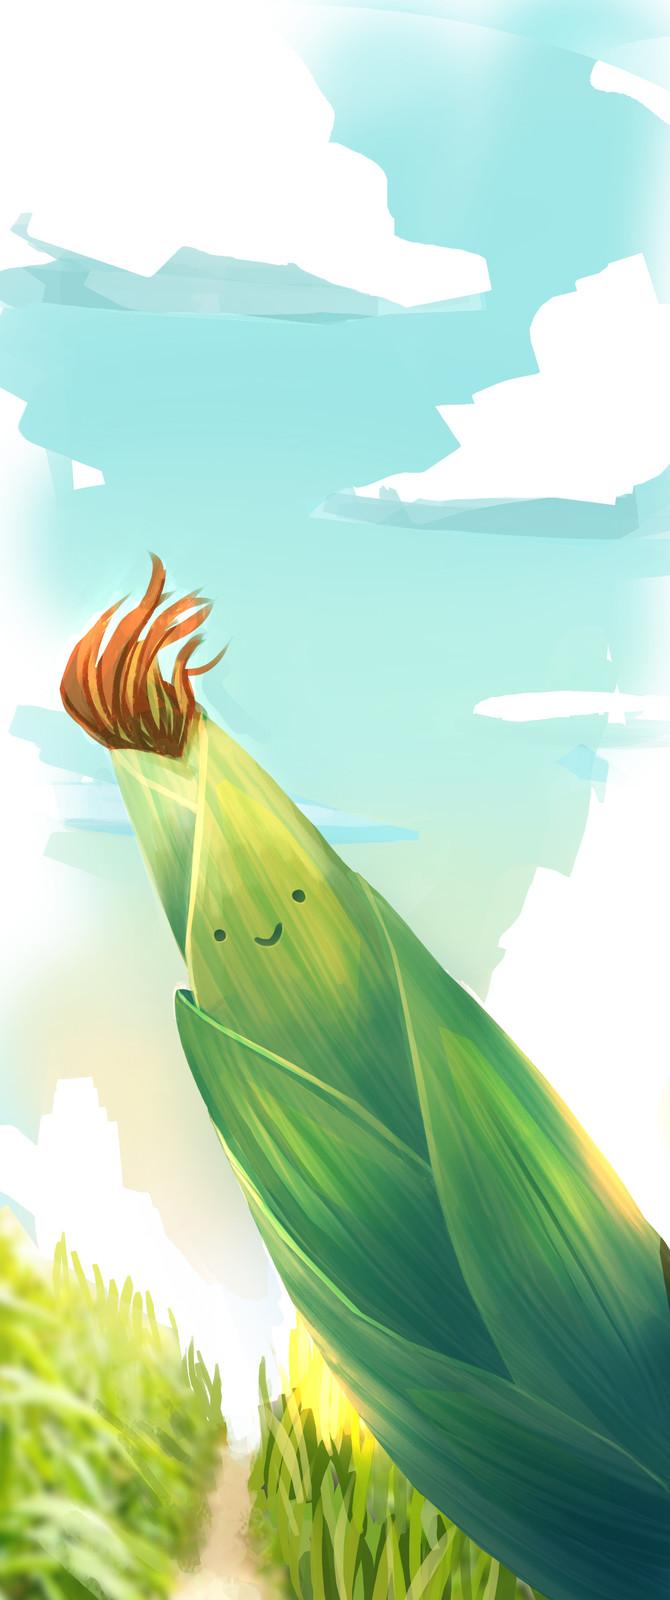 Have a friendly corn